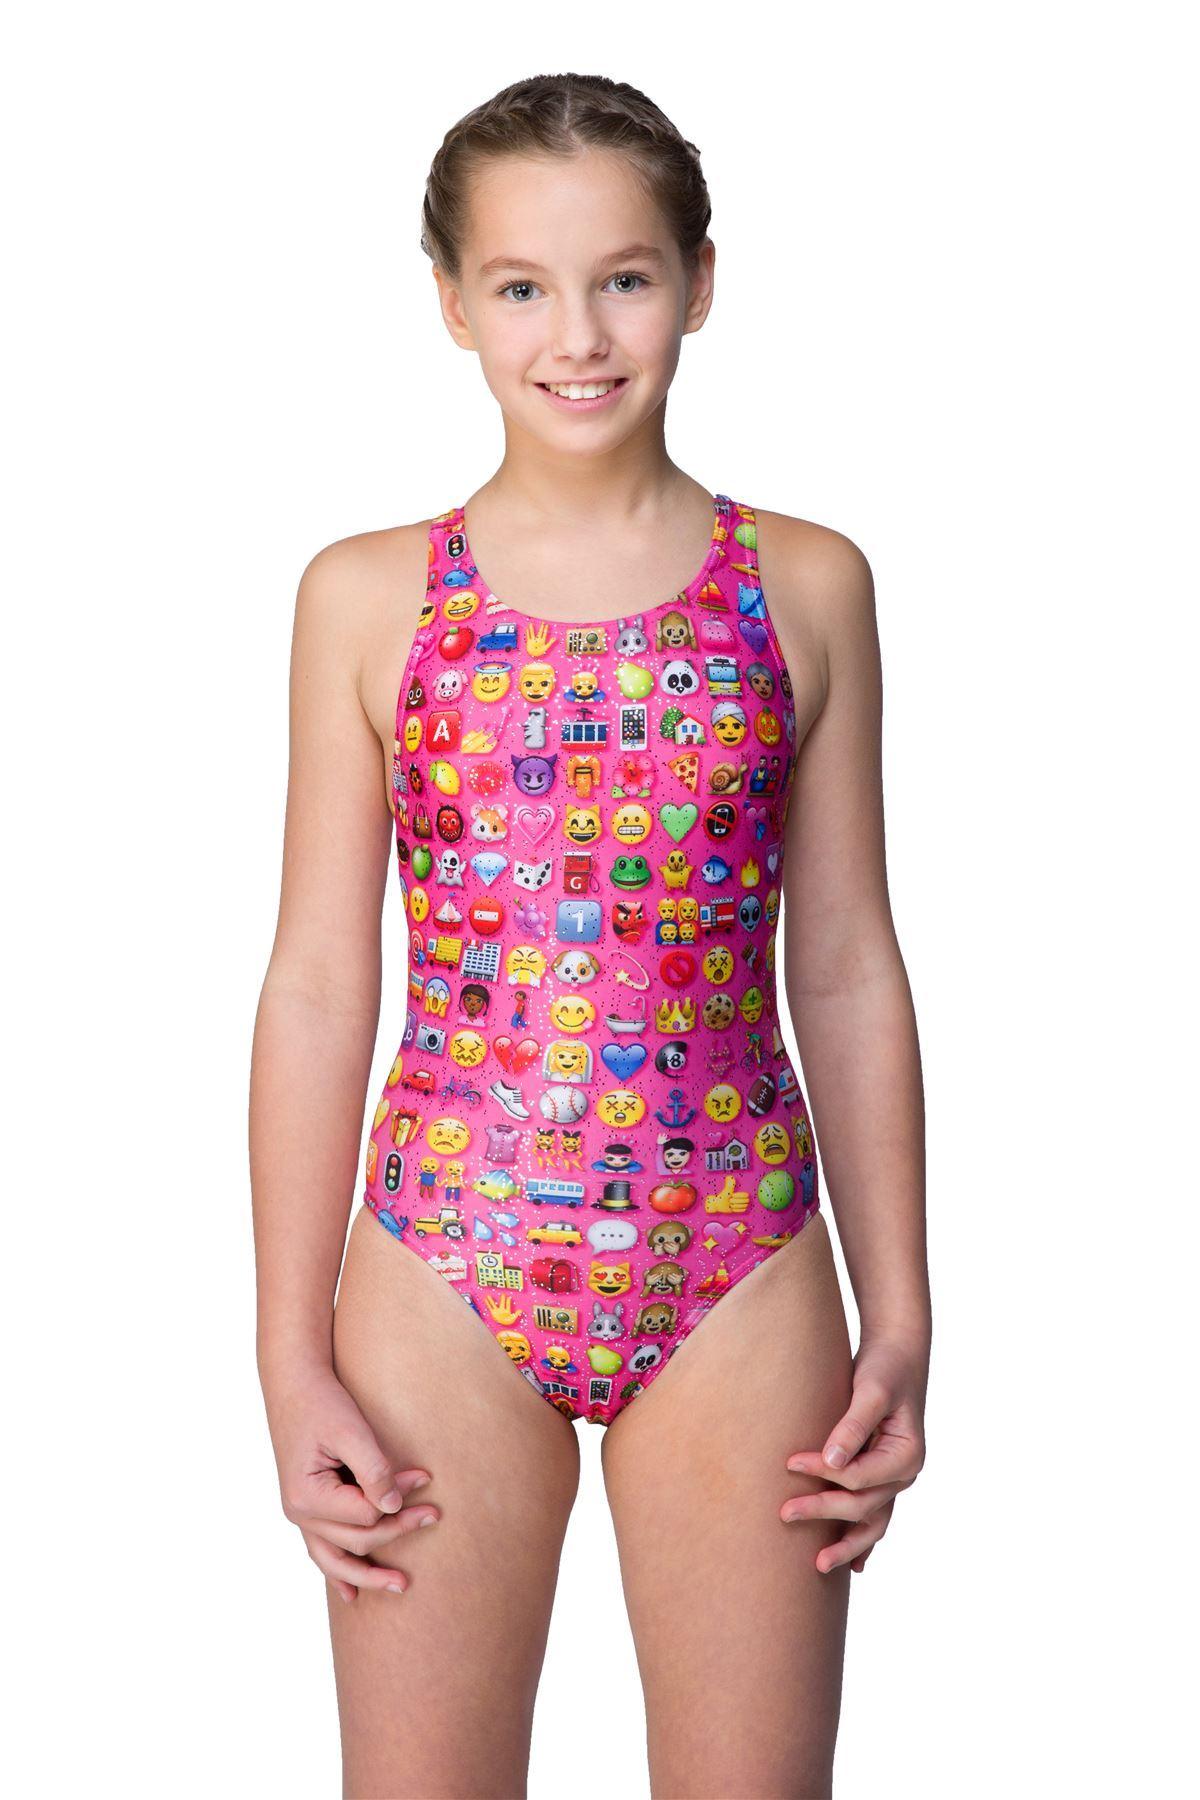 Maru-Girls-Junior-Design-Raveback-Swimsuit-Swimming-Costume-  sc 1 st  eBay & Maru Girls Junior Design Raveback Swimsuit Swimming Costume Swimwear ...